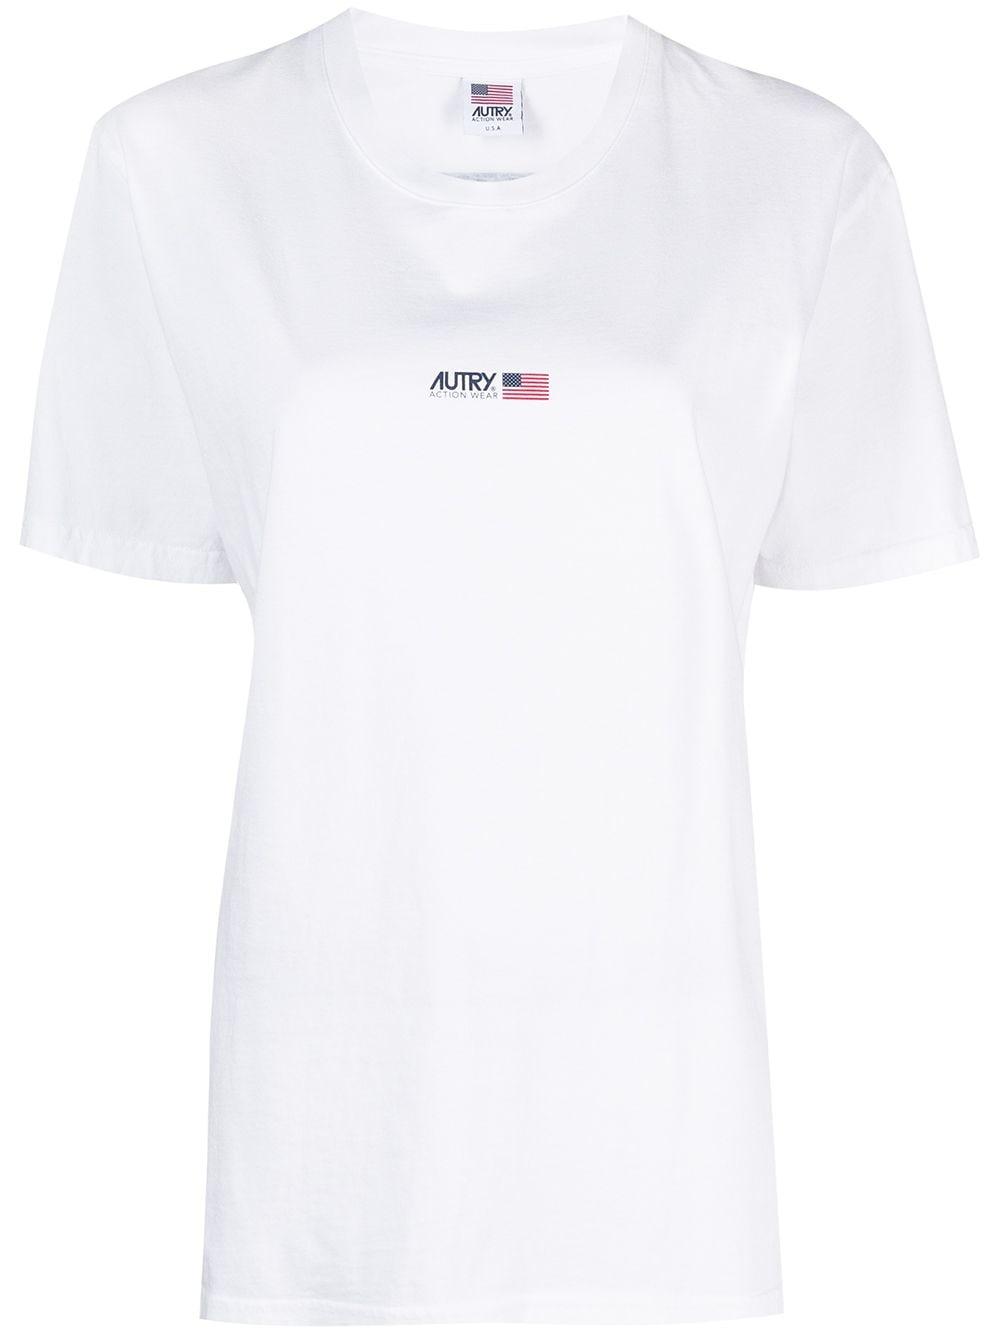 Autry t-shirt capsule open Wouomo AUTRY | T-shirt | TSXWA06W